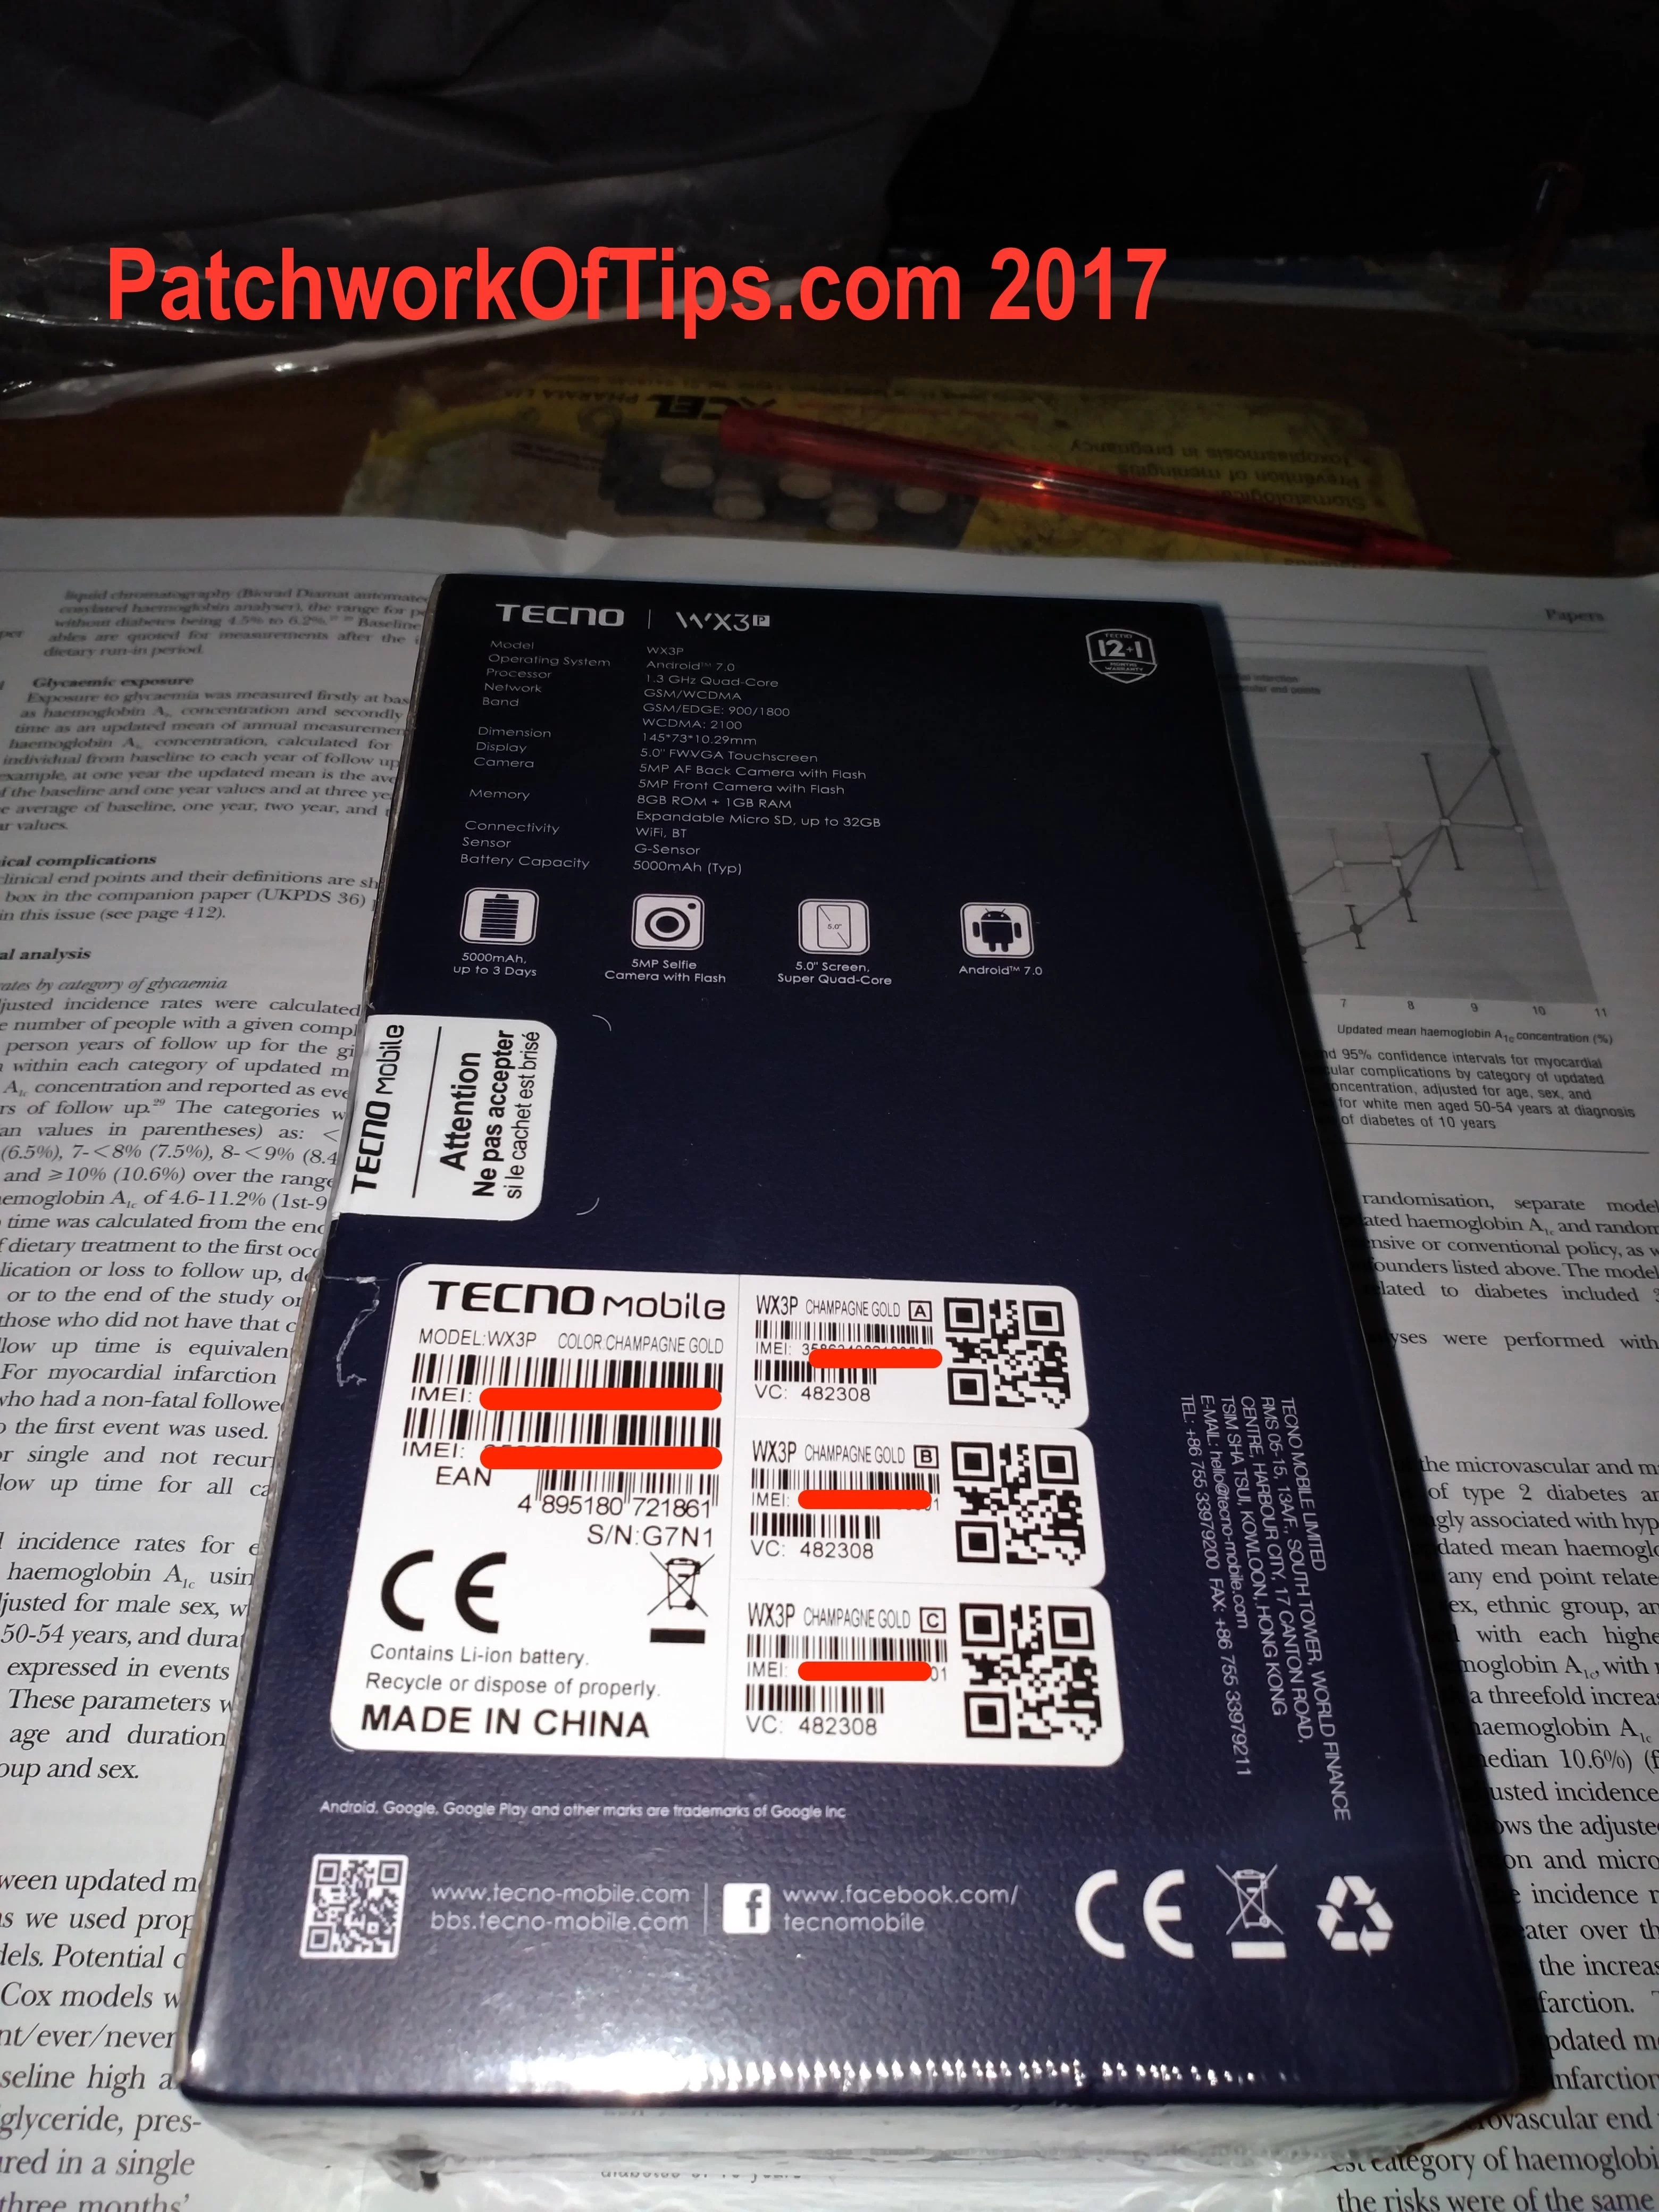 Unboxing The Tecno WX3P 5,000mAh Phone + Full Specs - Mobile